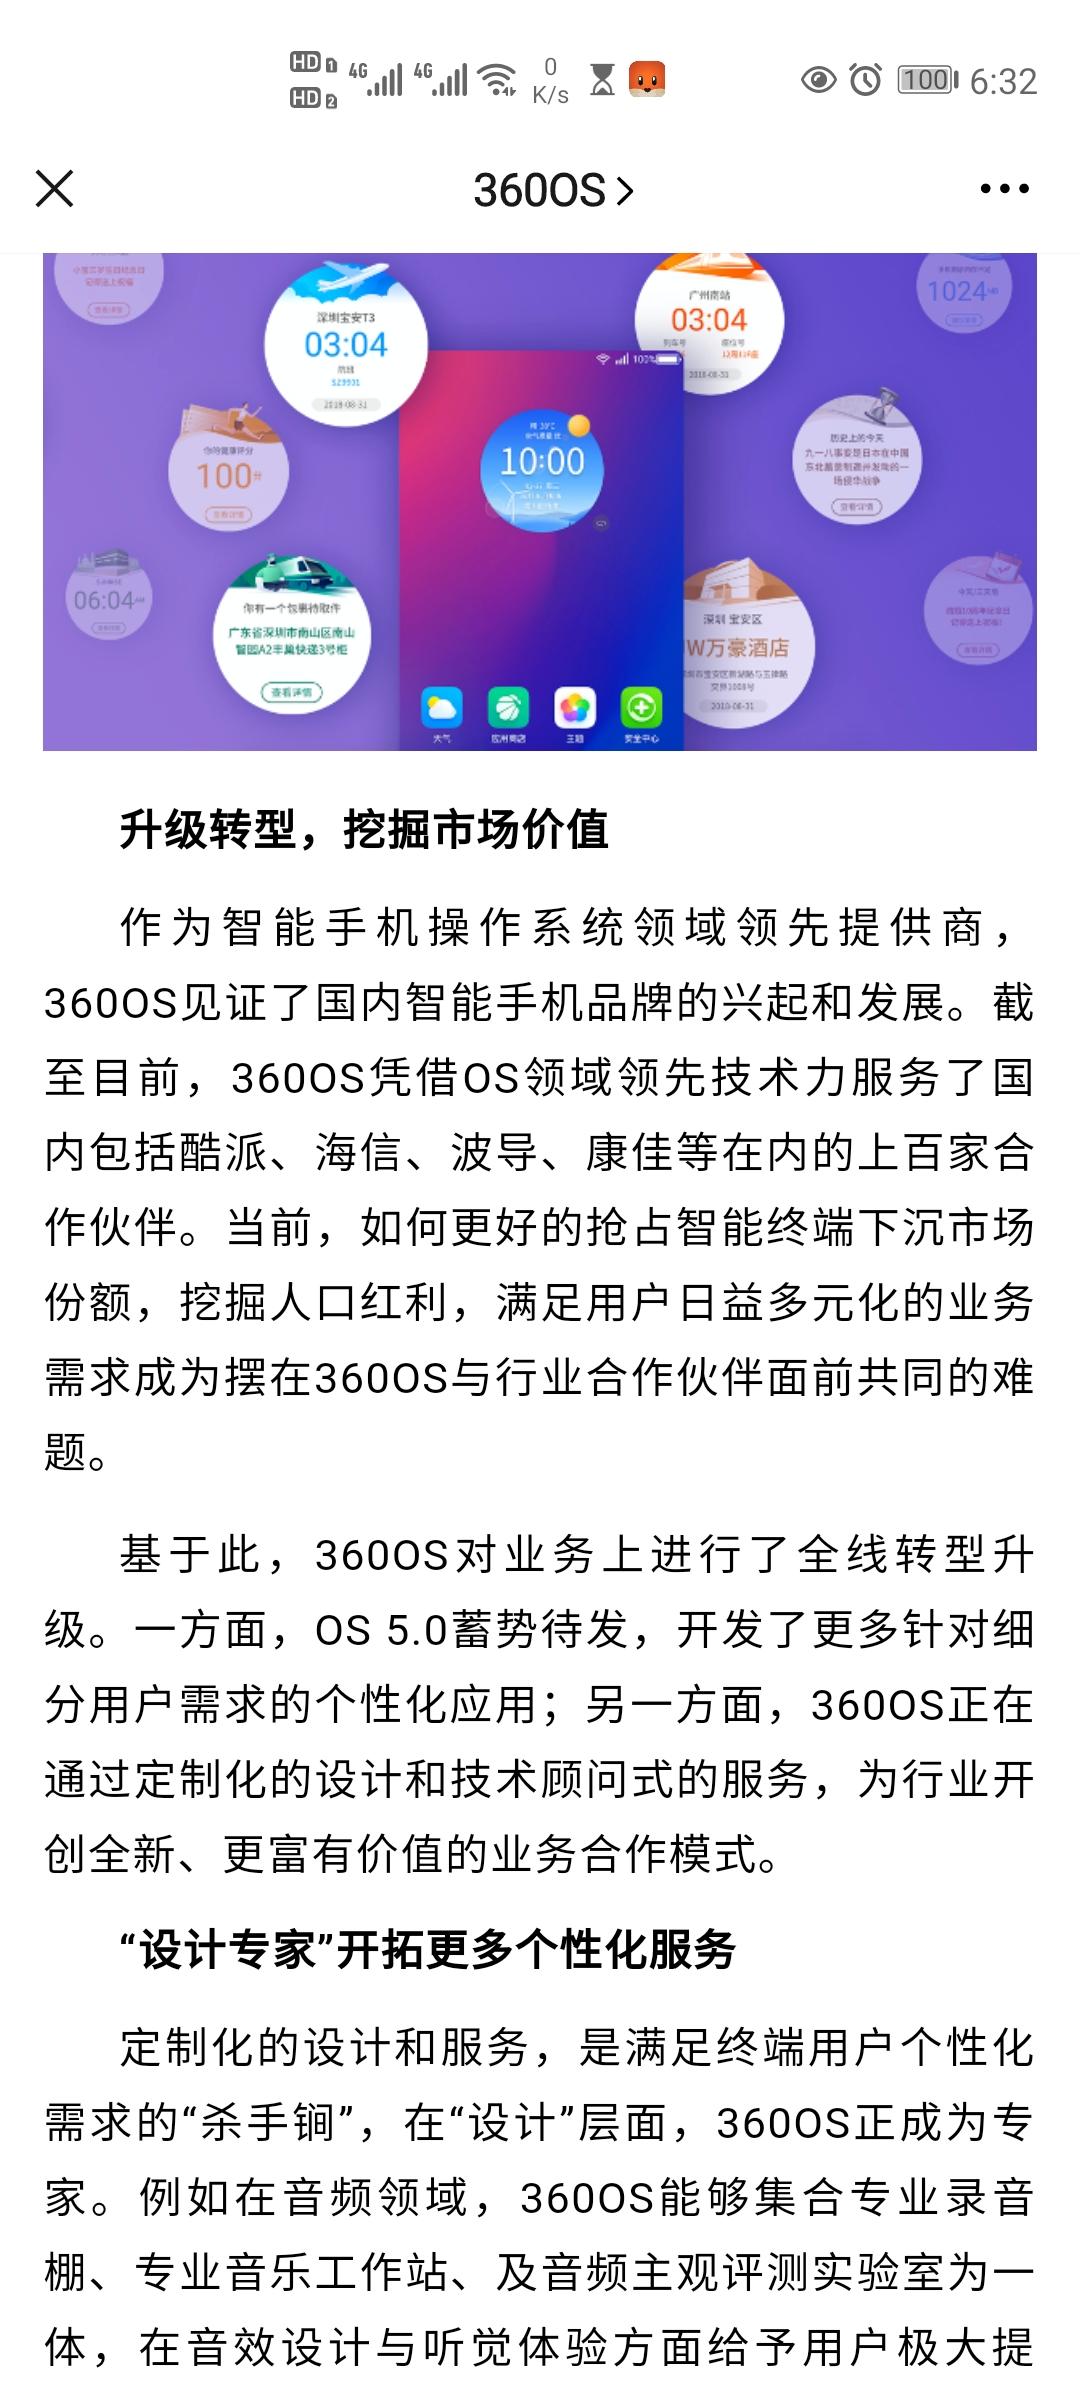 Screenshot_20200610_183238_com.tencent.mm.jpg